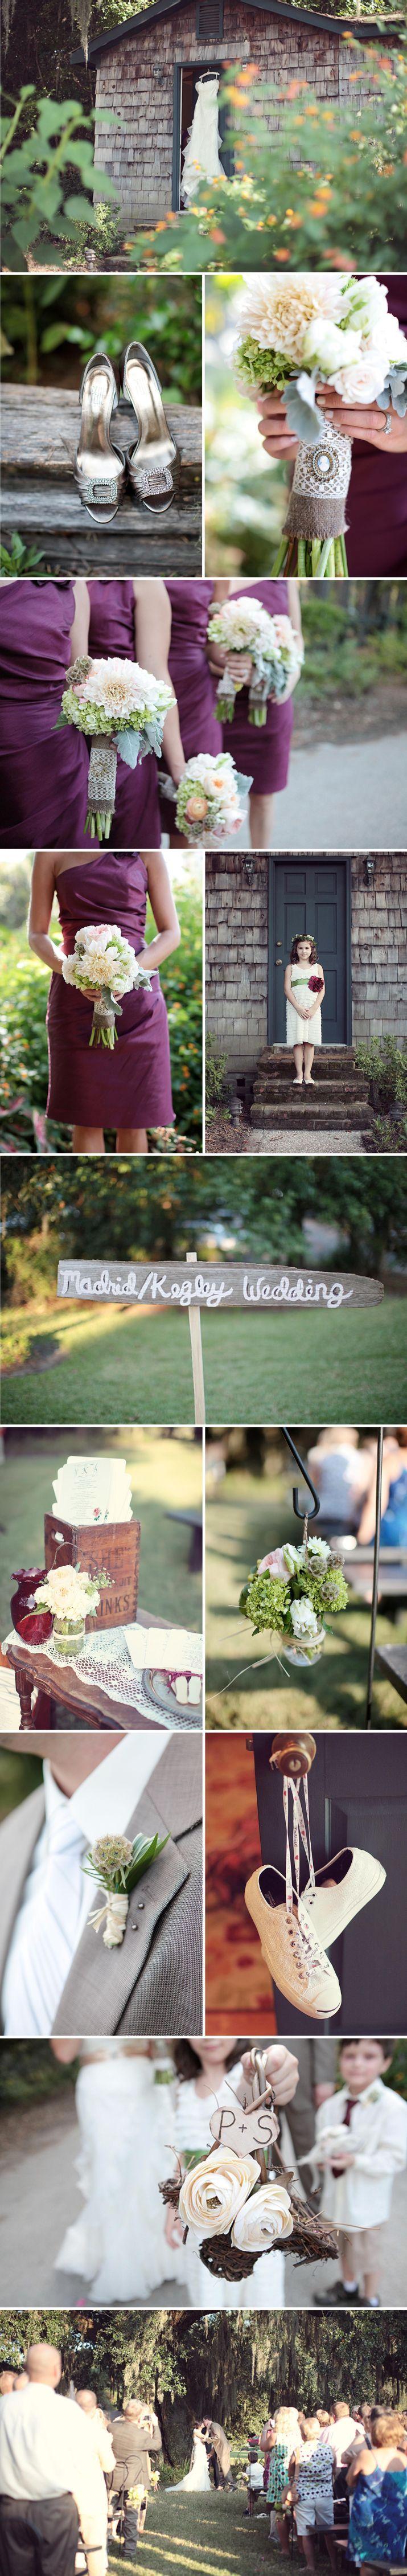 207 best rustic weddings images on pinterest marriage rustic